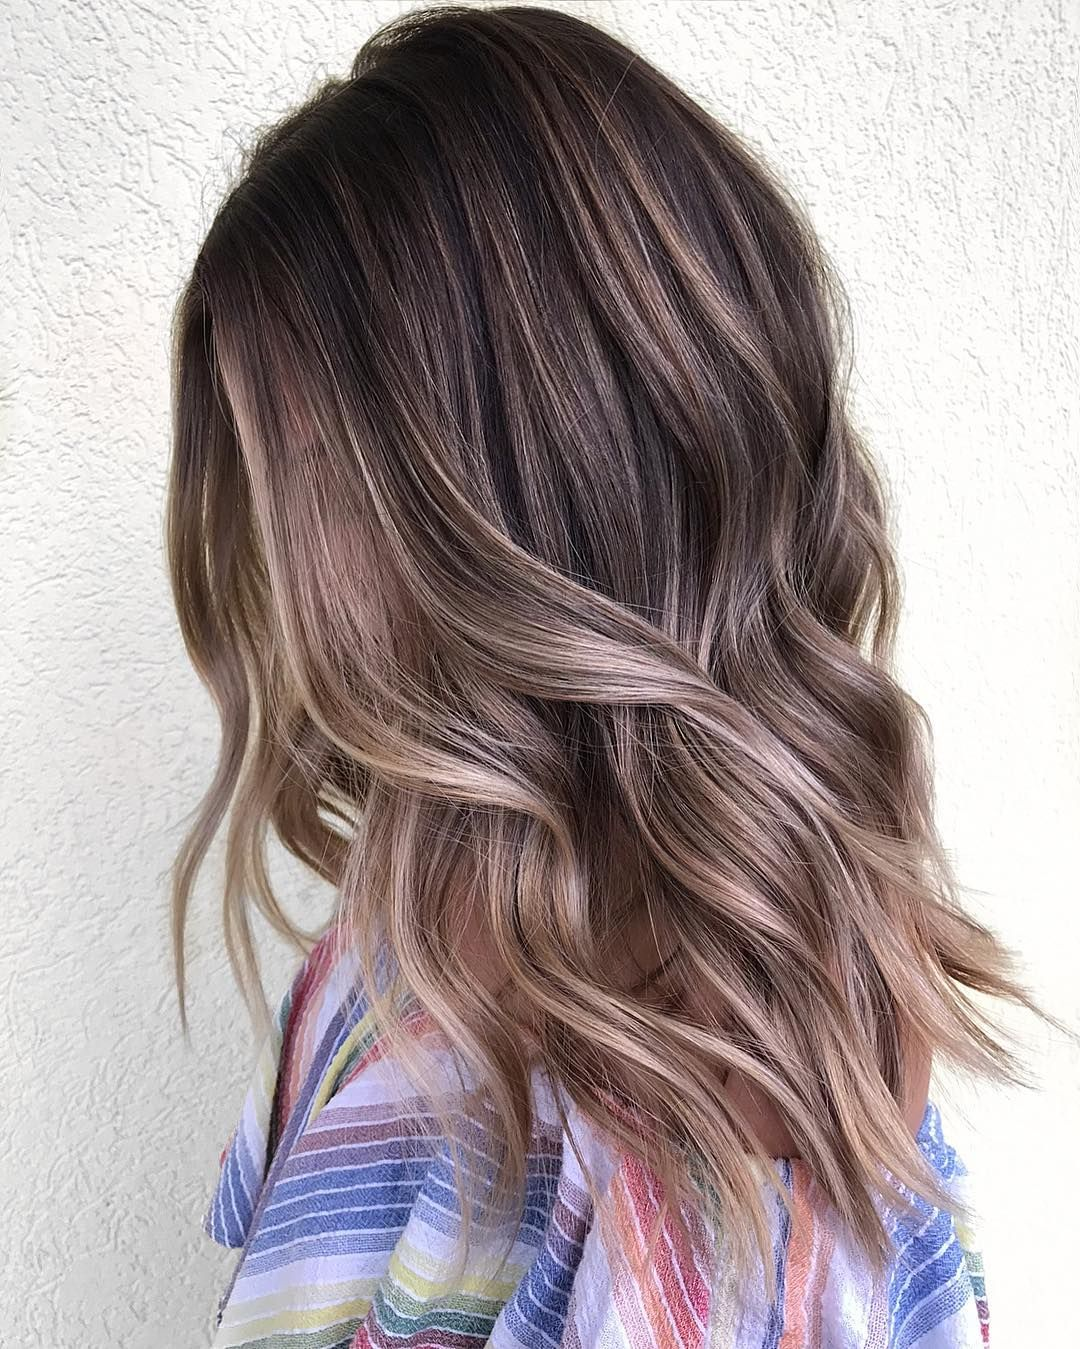 70 Flattering Balayage Hair Color Ideas For 2020 Hair Color Balayage Light Brown Balayage Brown Hair Balayage